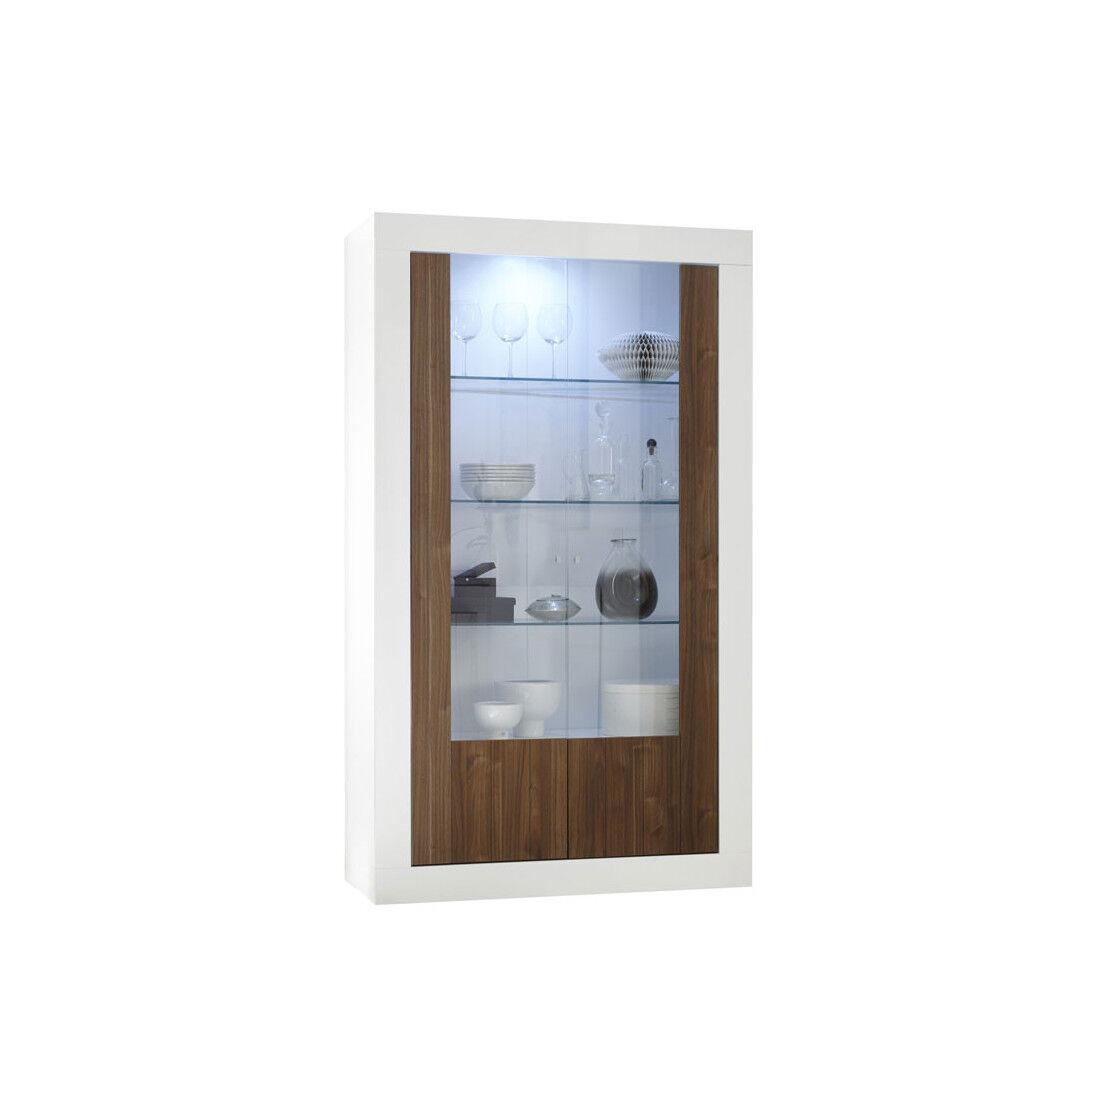 Tousmesmeubles Vitrine 2 portes Blanc/Noyer à LEDs - LUBIO - L 110 x l 42 x H 191